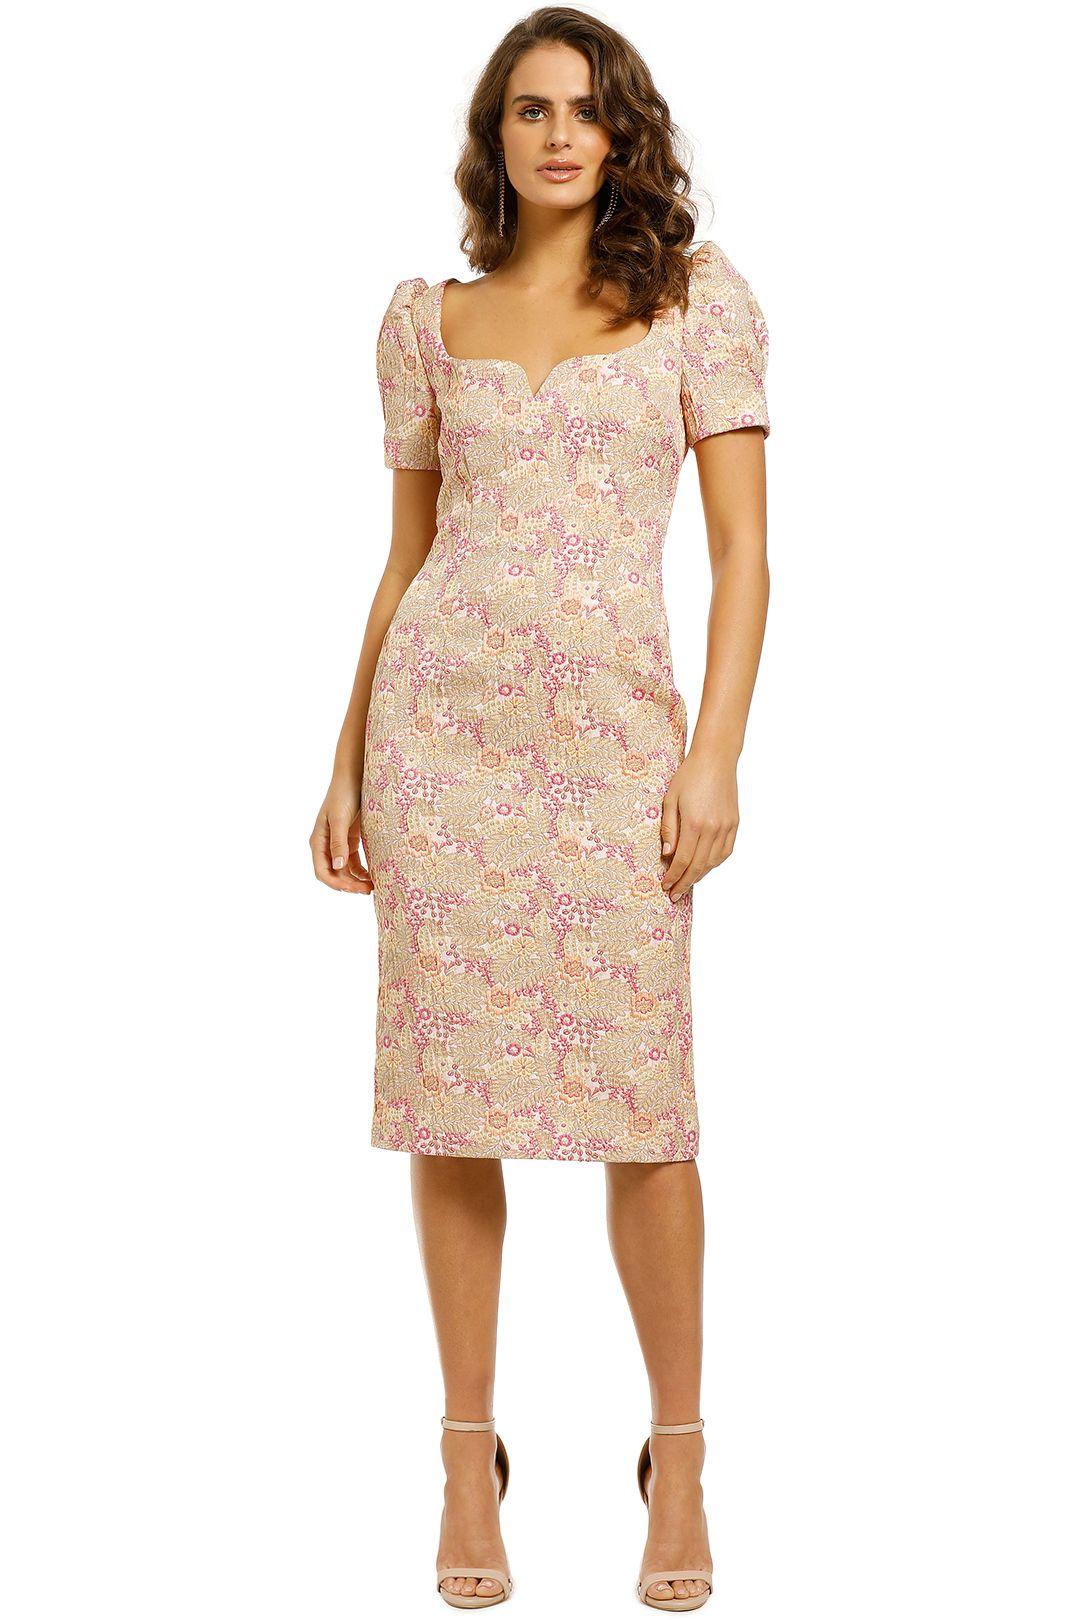 Rebecca-Vallance-Stella-Midi-Dress-Pink-Floral-Front